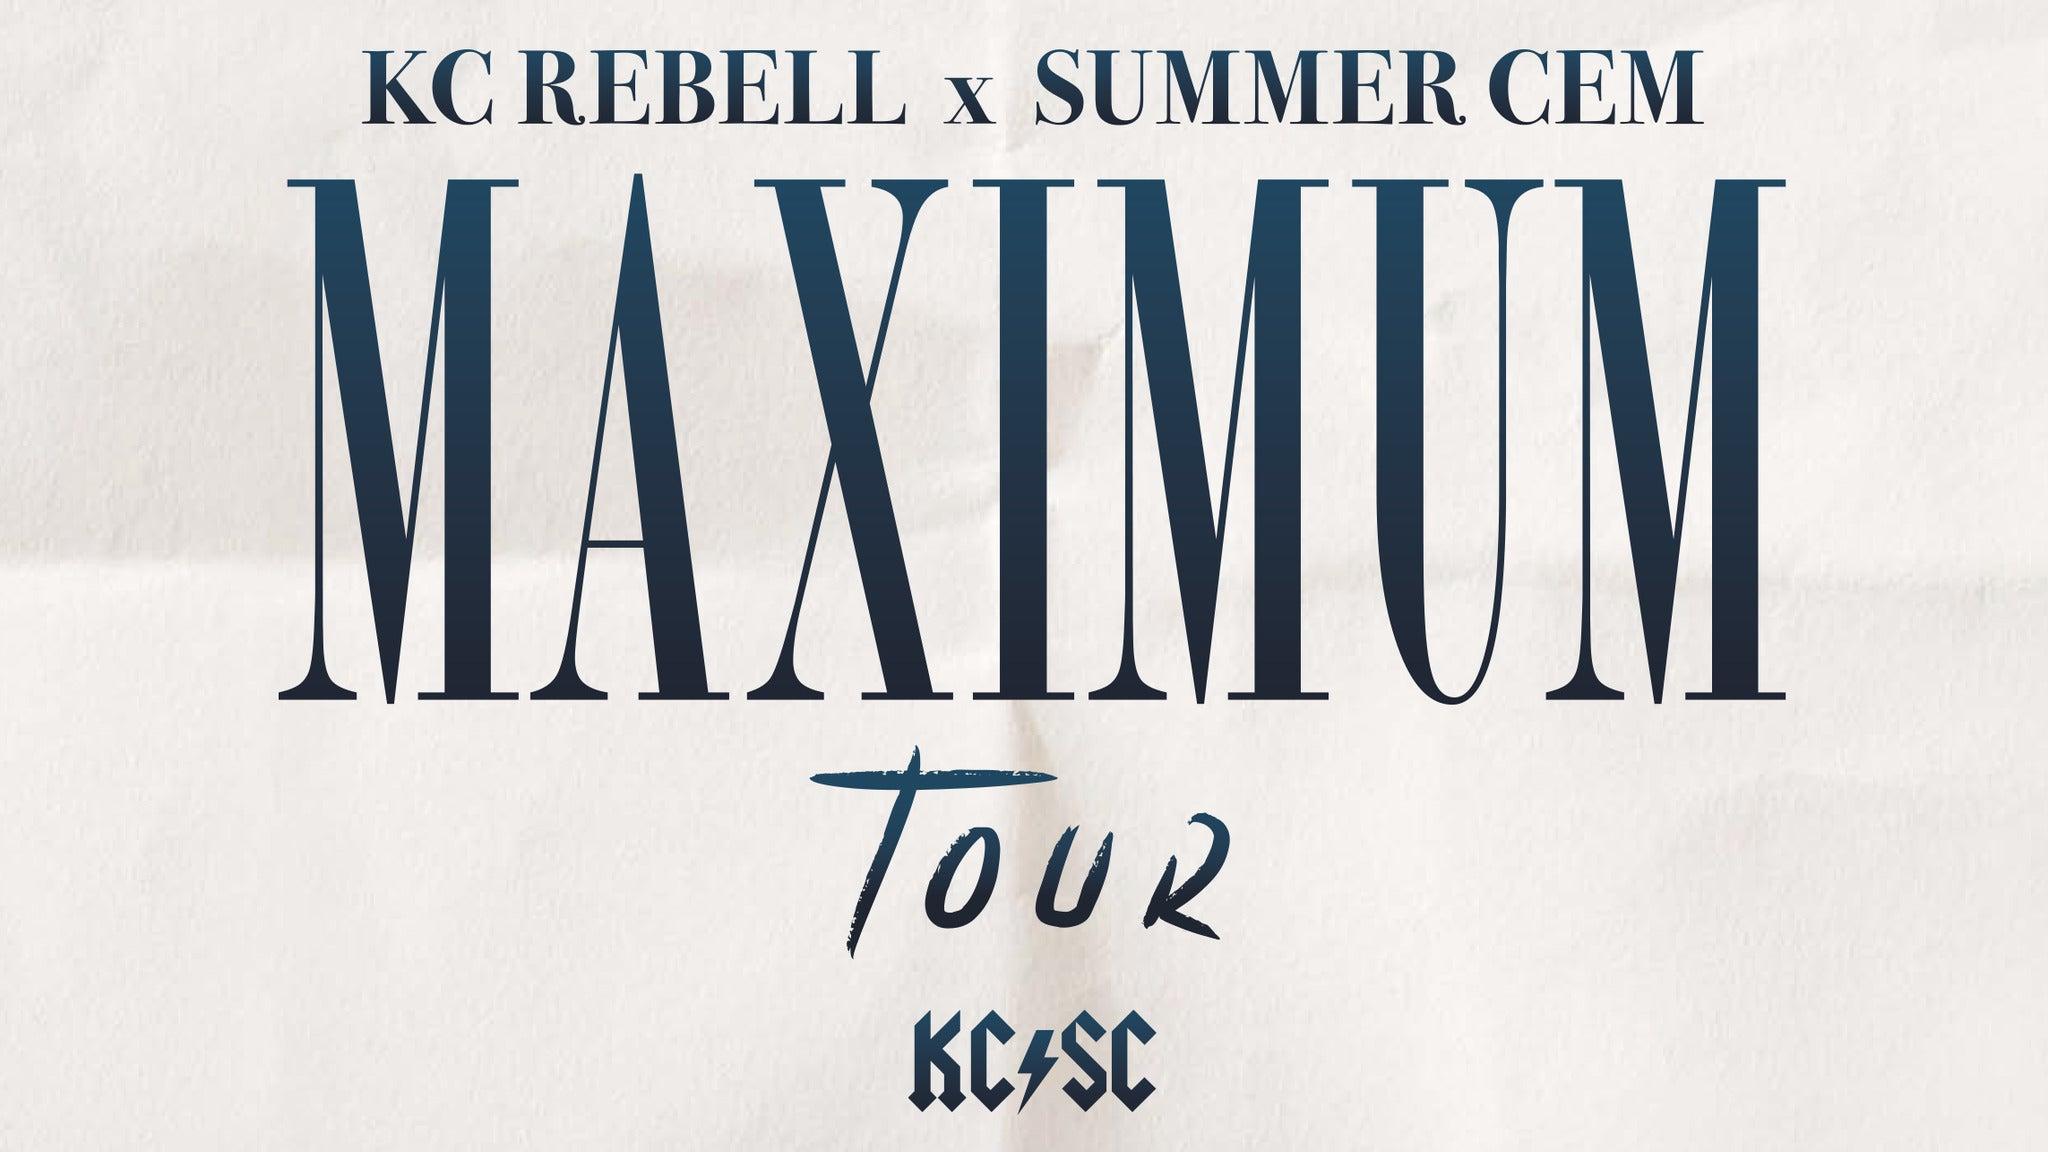 KC Rebell & Summer Cem